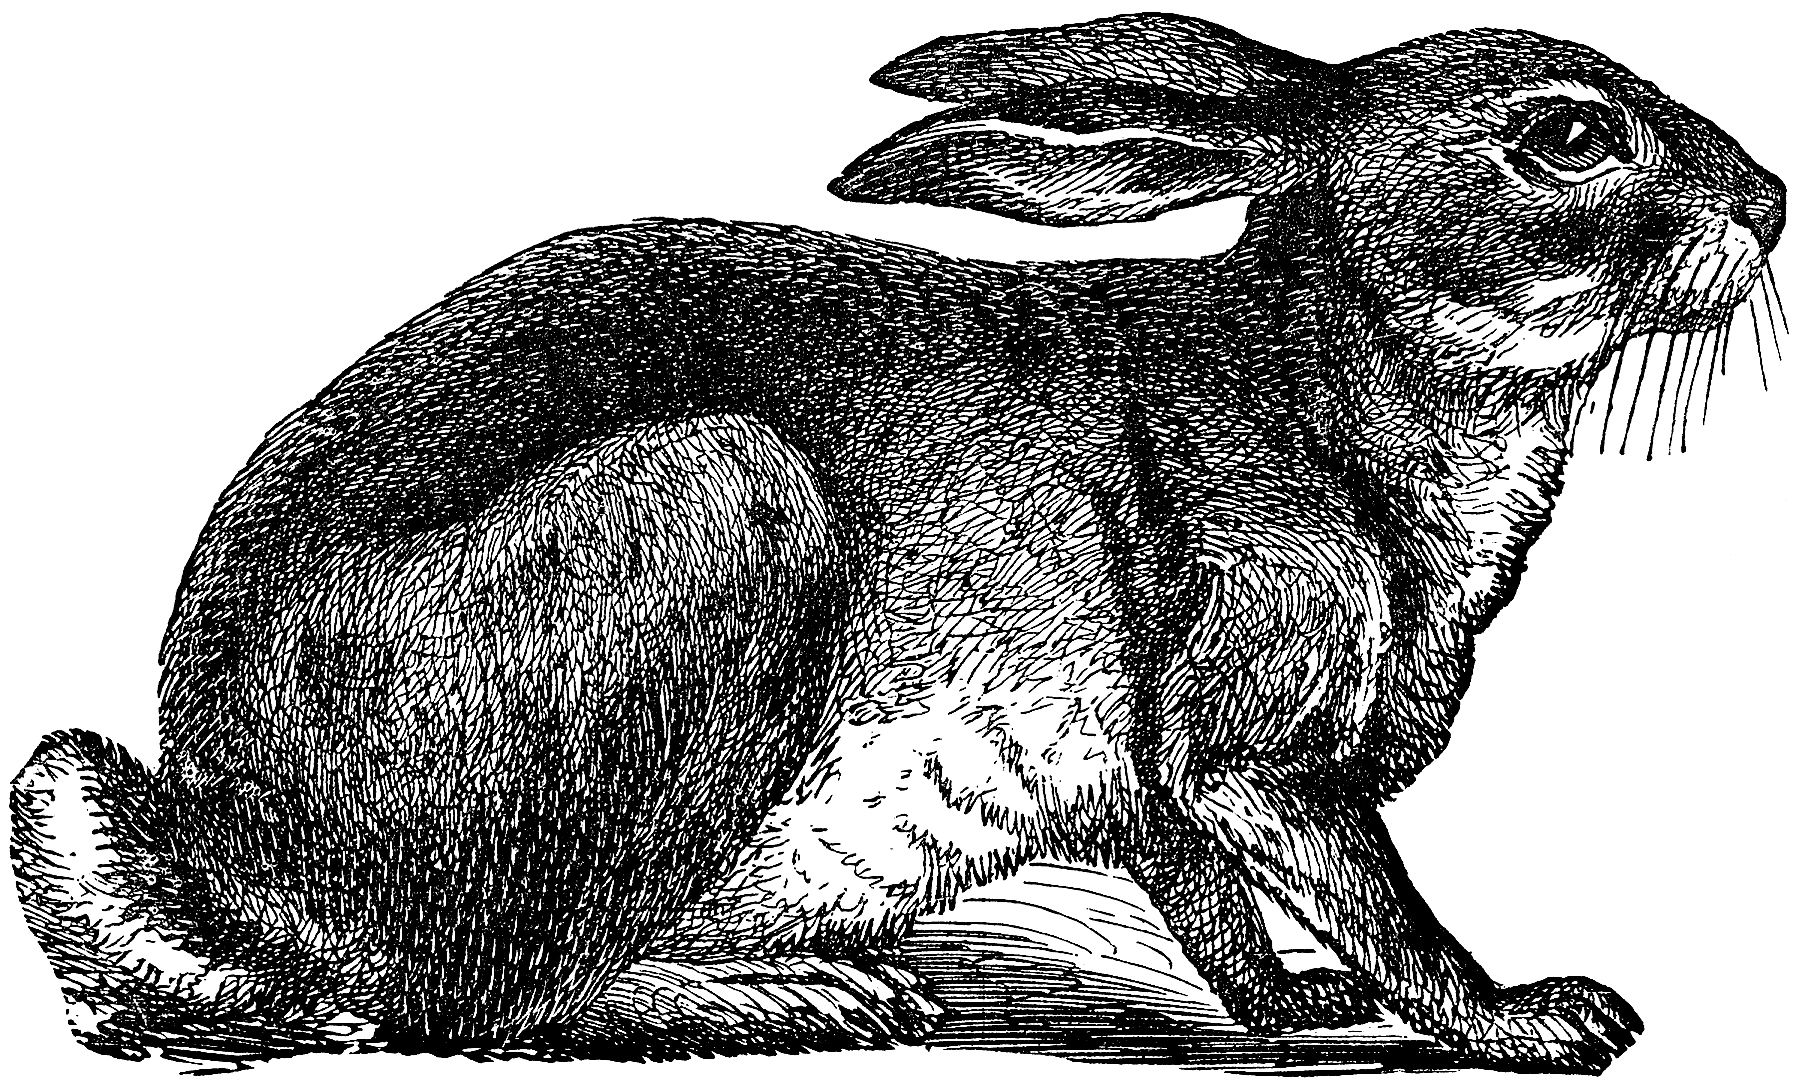 Cute Vintage Black And White Rabbit Engraving!